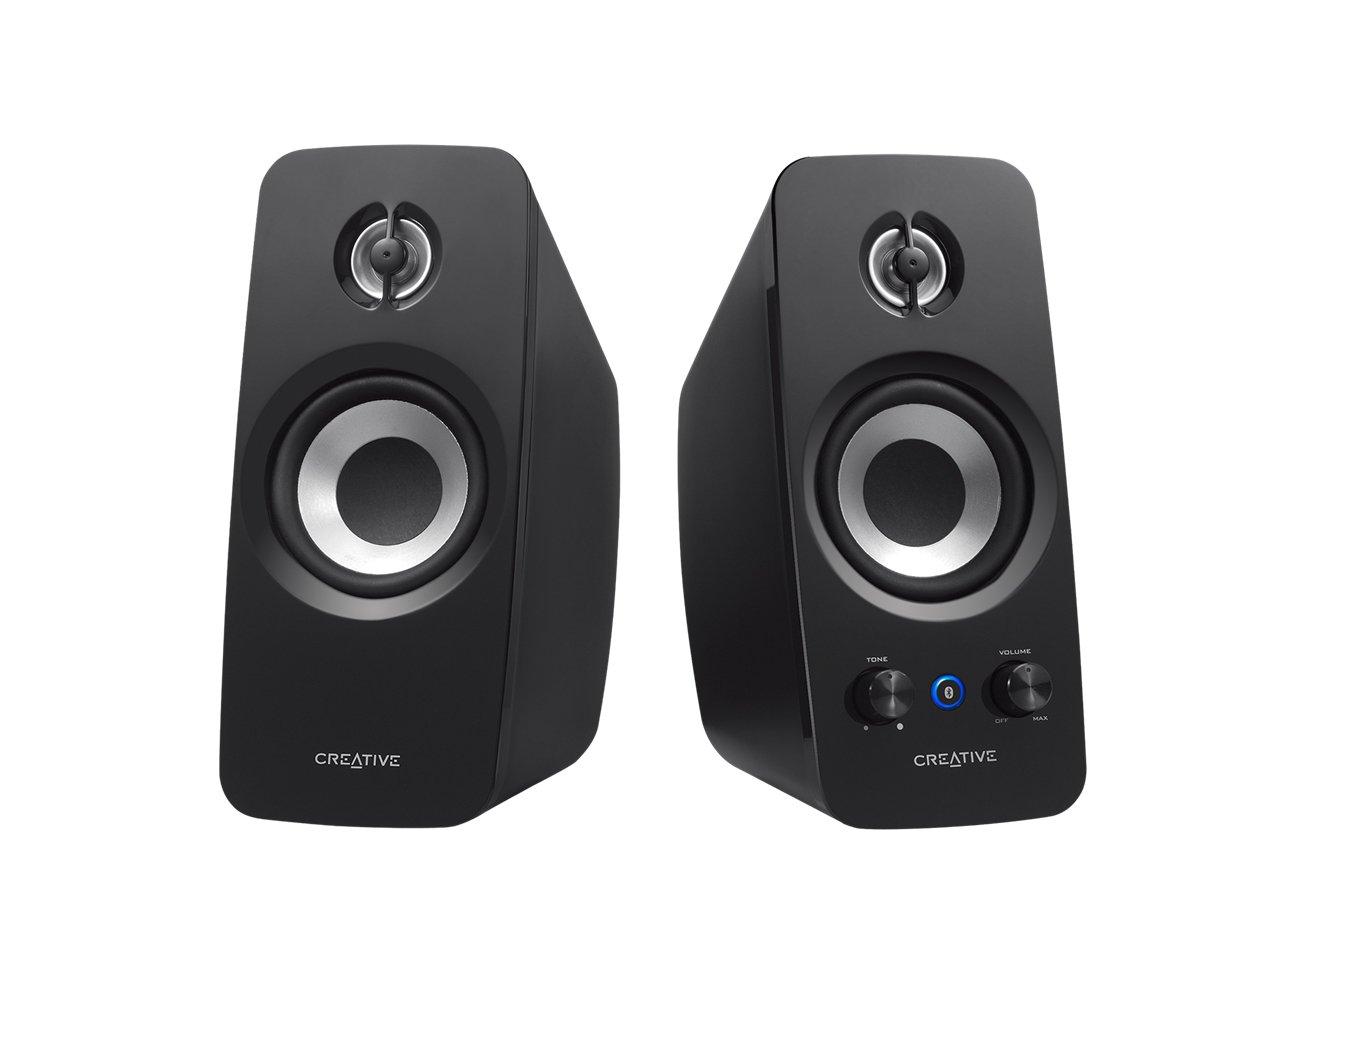 Creative T15 Wireless - Haut-parleurs Multimedia sans fil 2.0 Bluetooth 51MF1670AA000 Enceinte